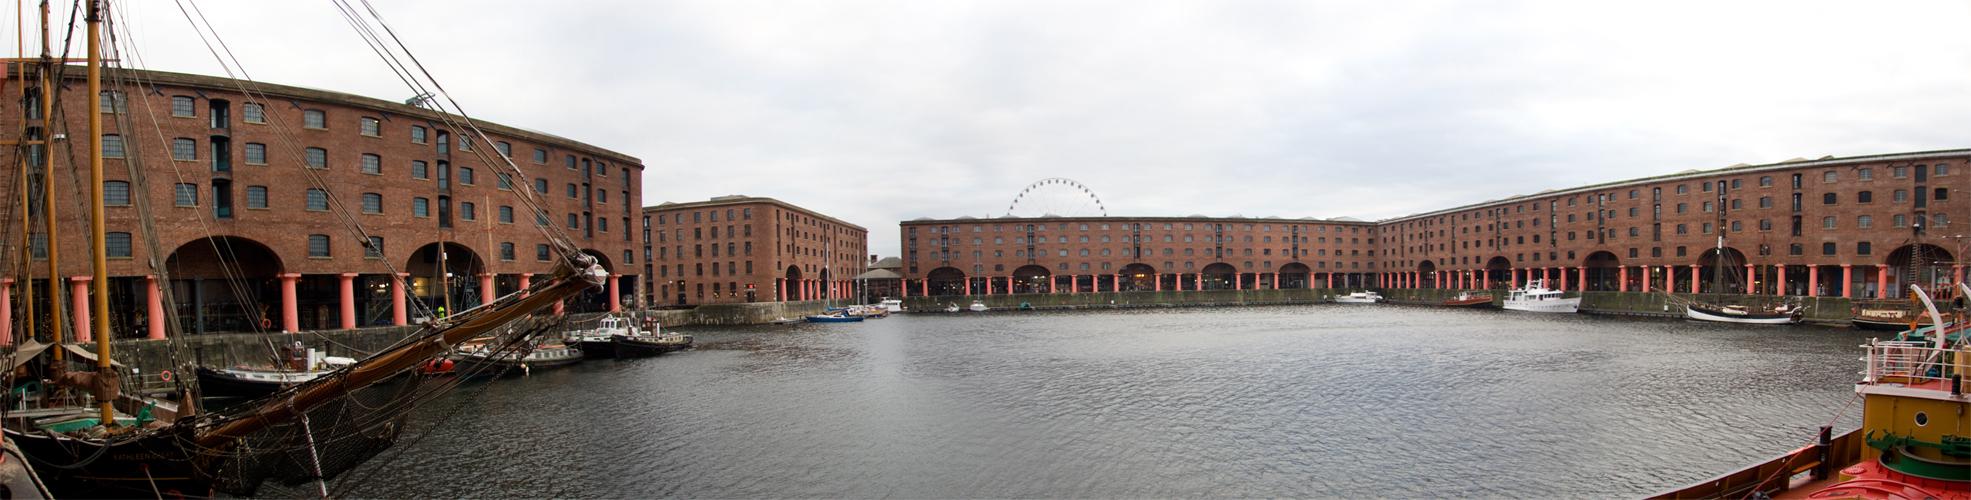 Panorama f the Liverpool docks